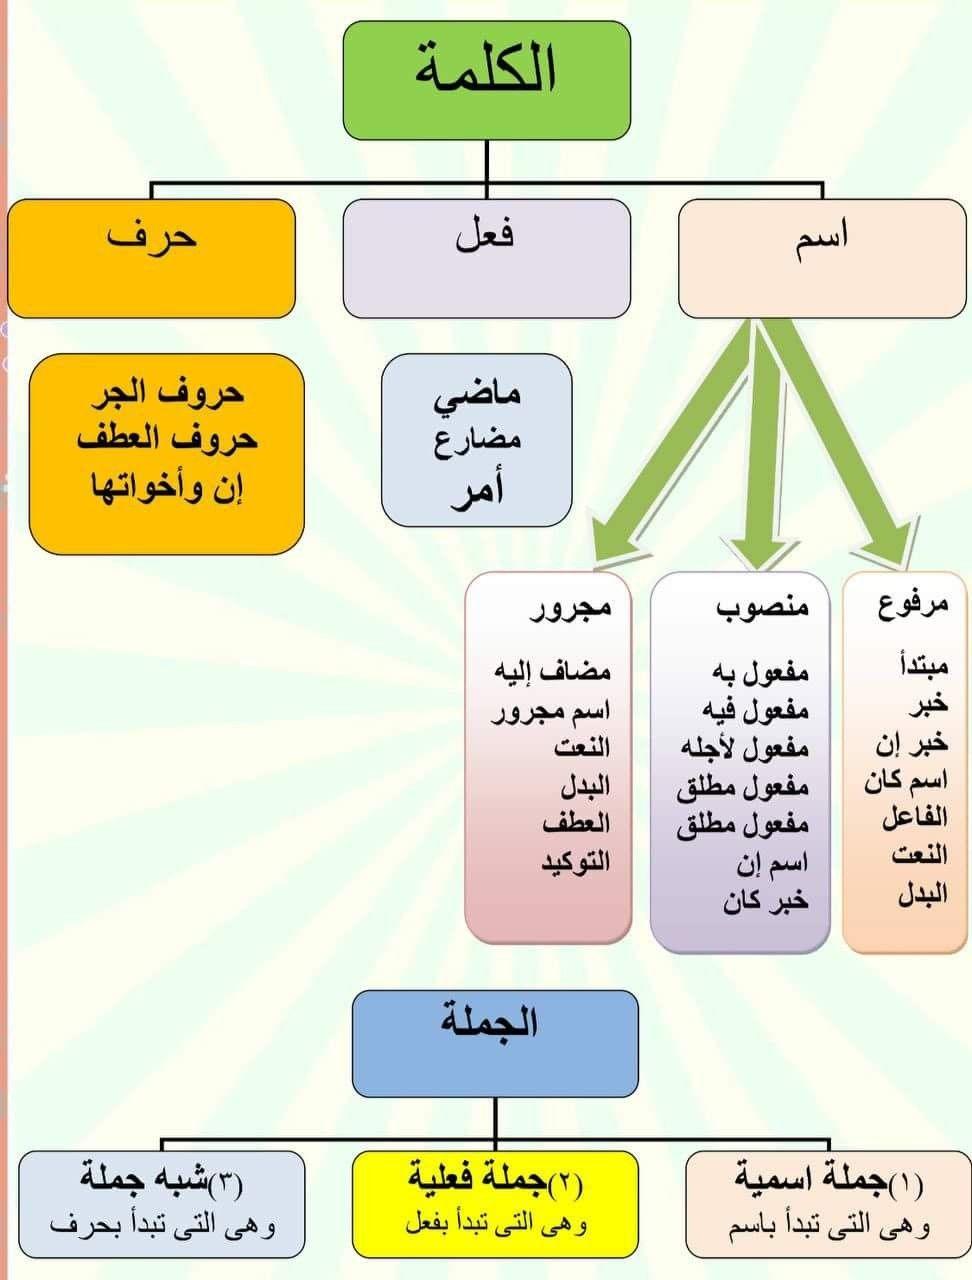 Caftan Morrocco Jellaba Caftan D Or Apprendre L Arabe Langue Arabe Apprendre L Islam